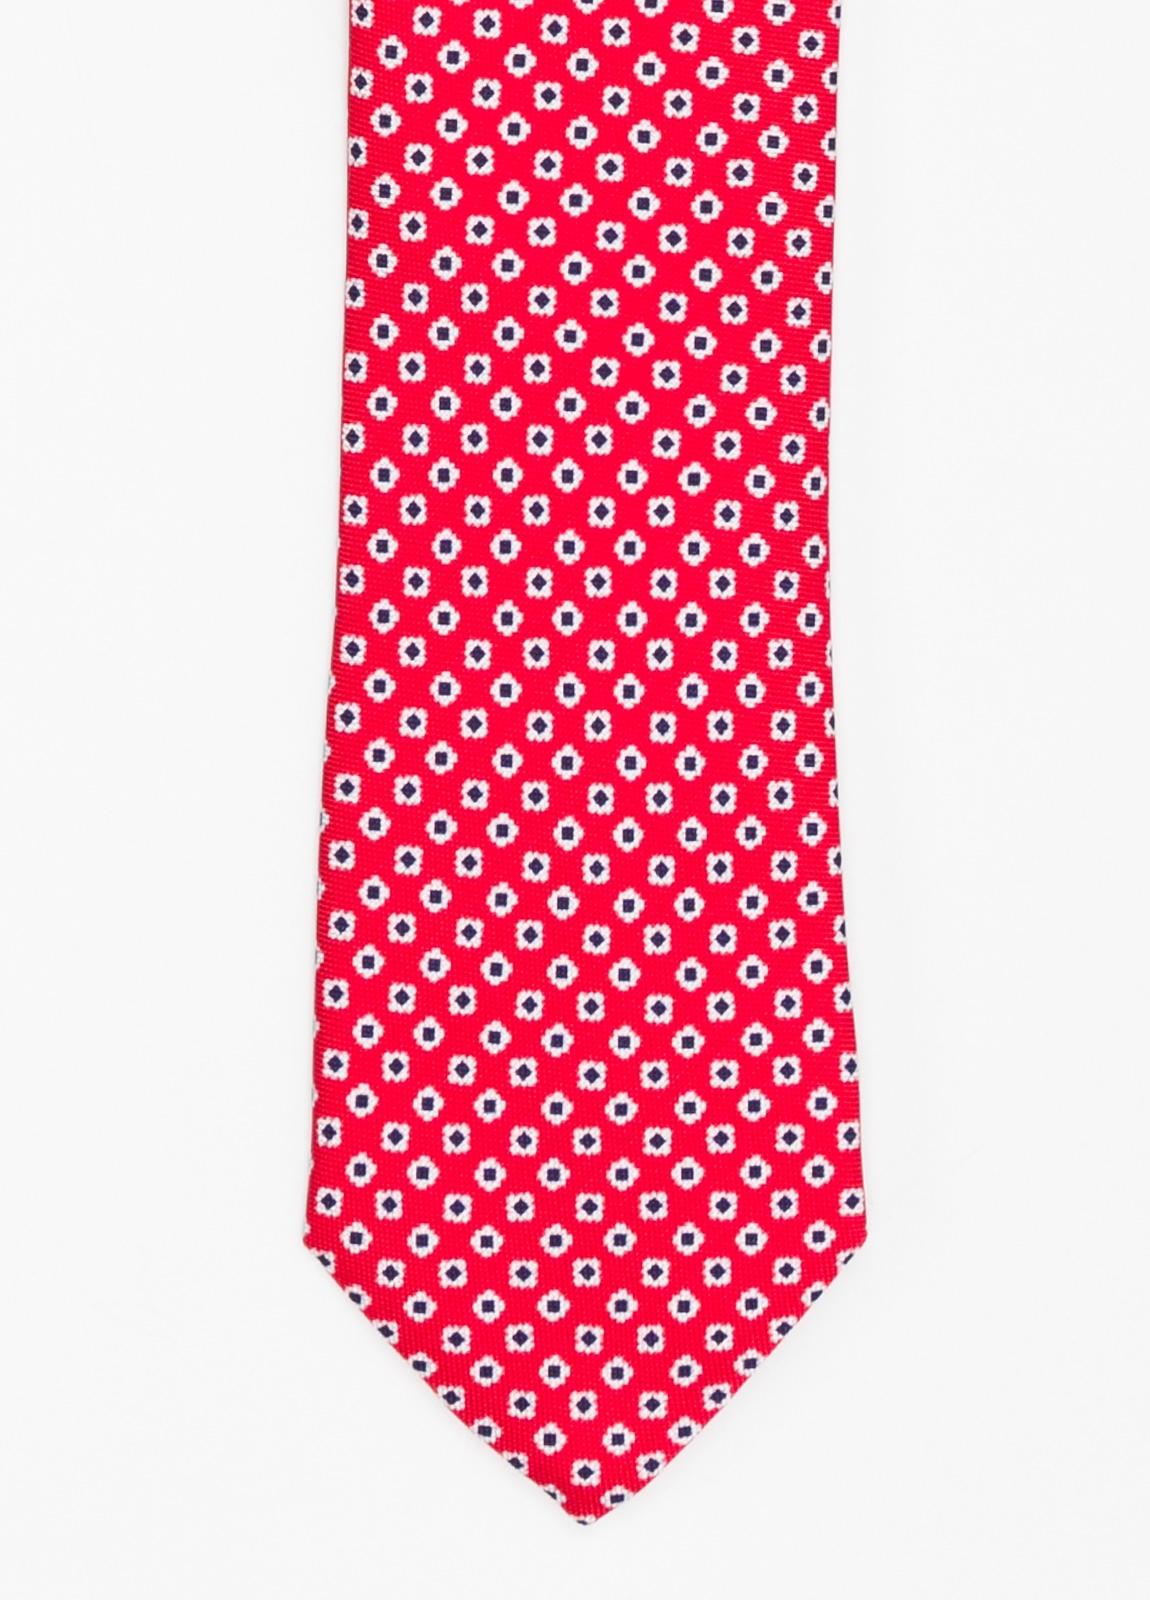 Corbata Formal Wear dibujo flor color rojo. Pala 7,5 cm. 100% Seda.